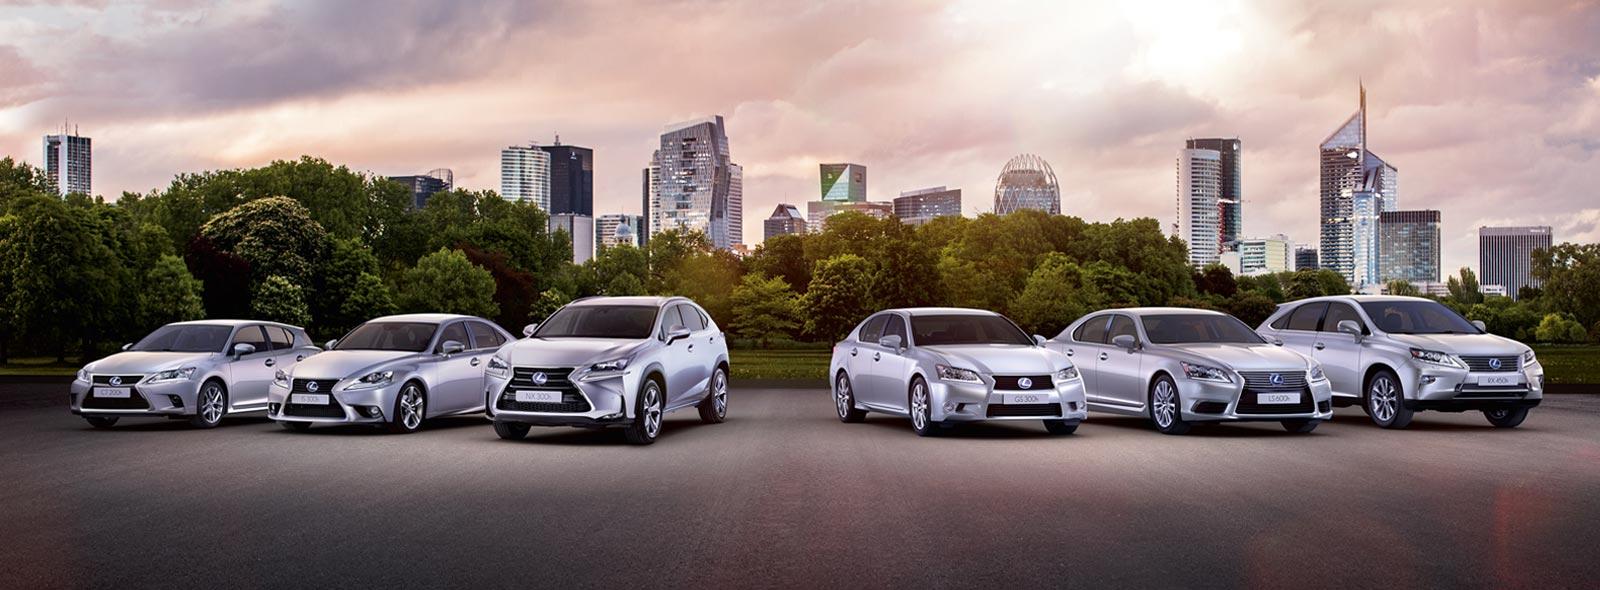 Lexus Hybrid Drive All Models